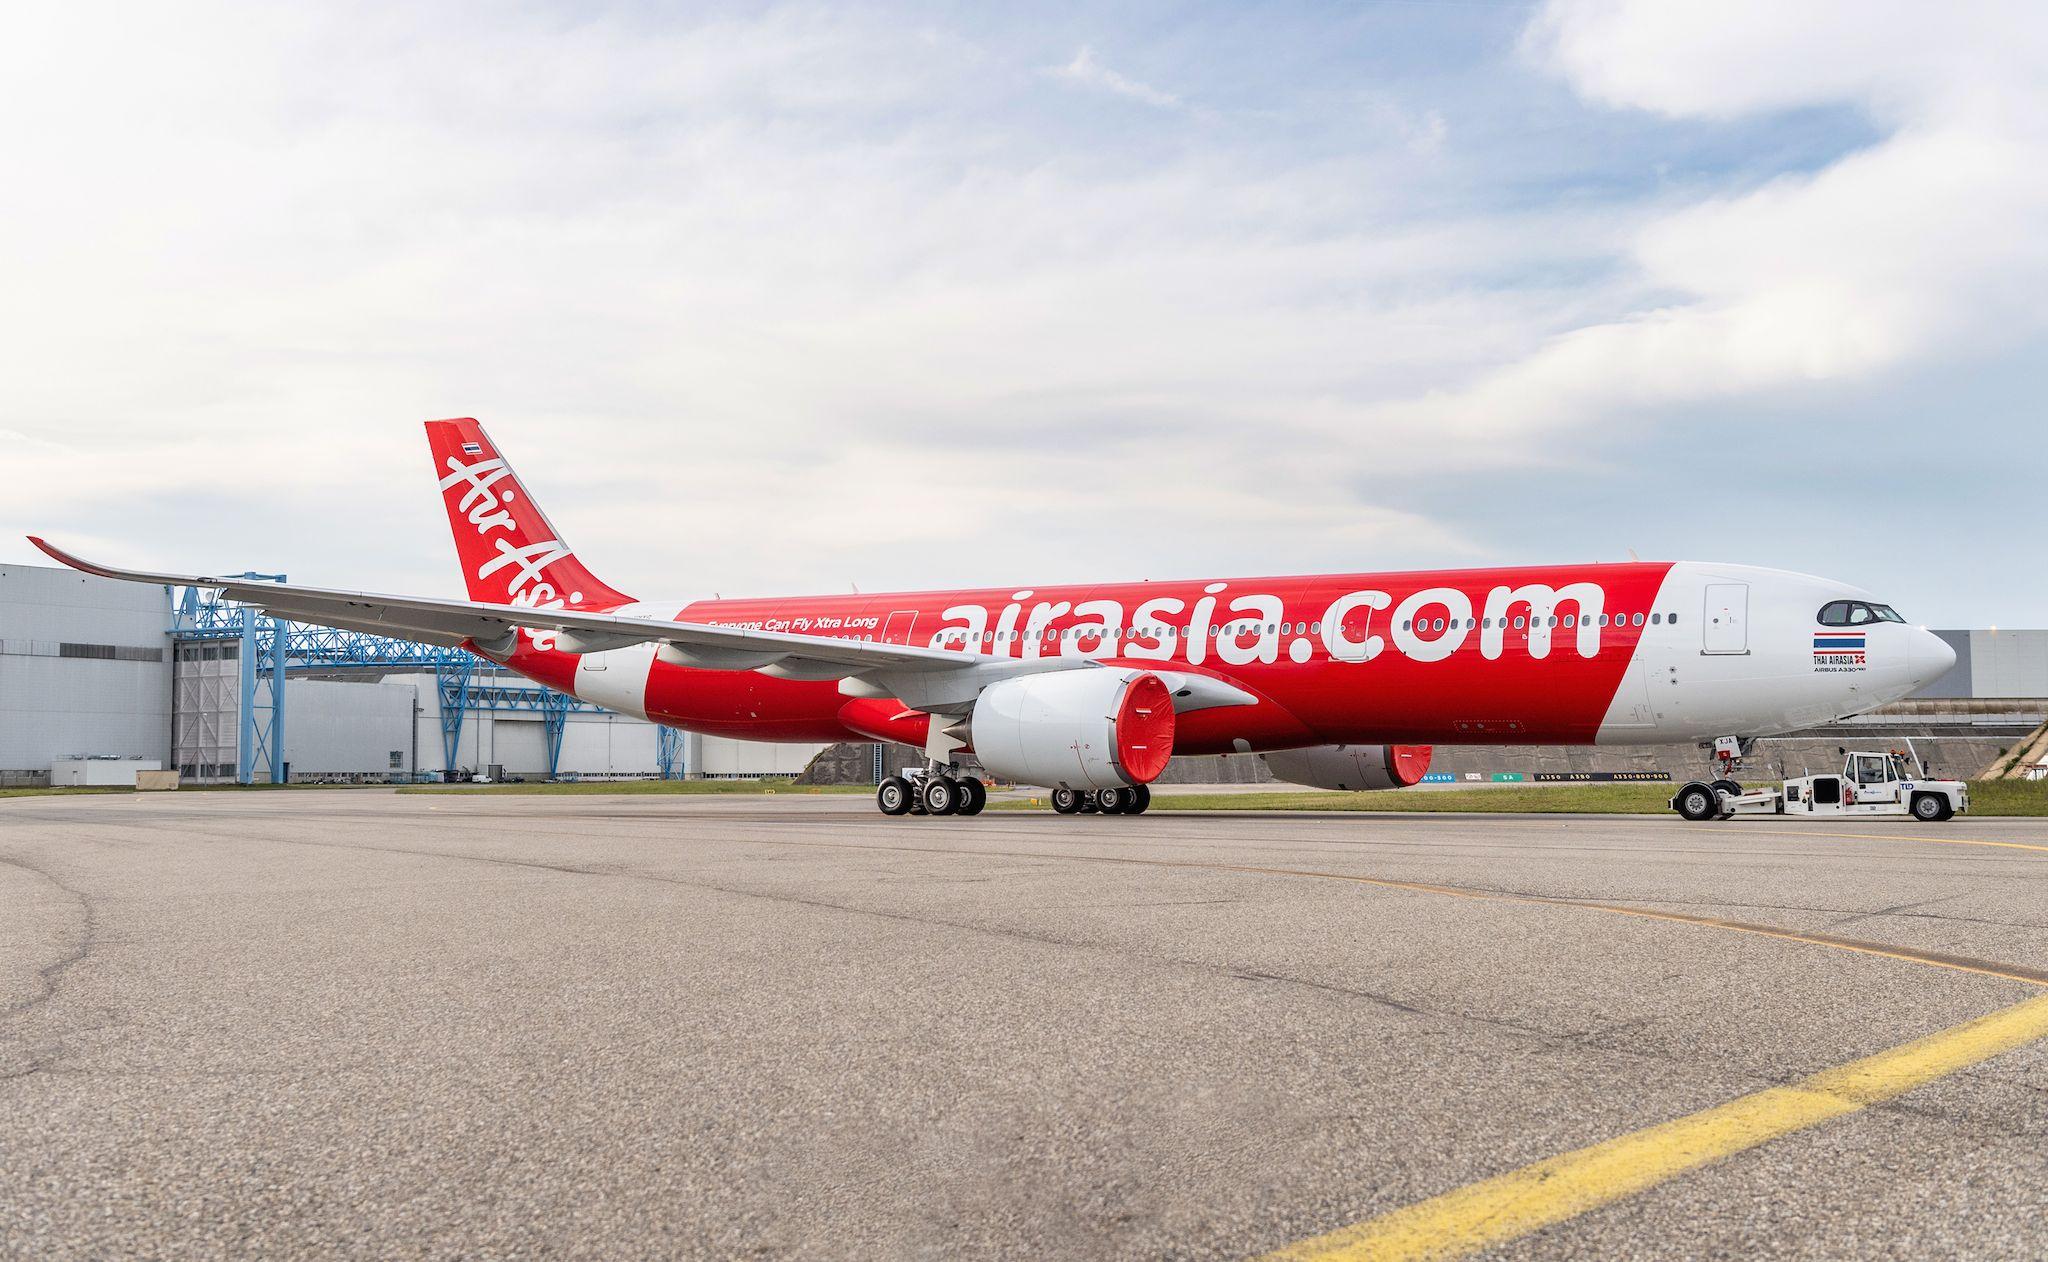 A330-90A330-900 AirAsia X [MSN1901] / F-WWYG0 AirAsia X [MSN1901] / F-WWYG